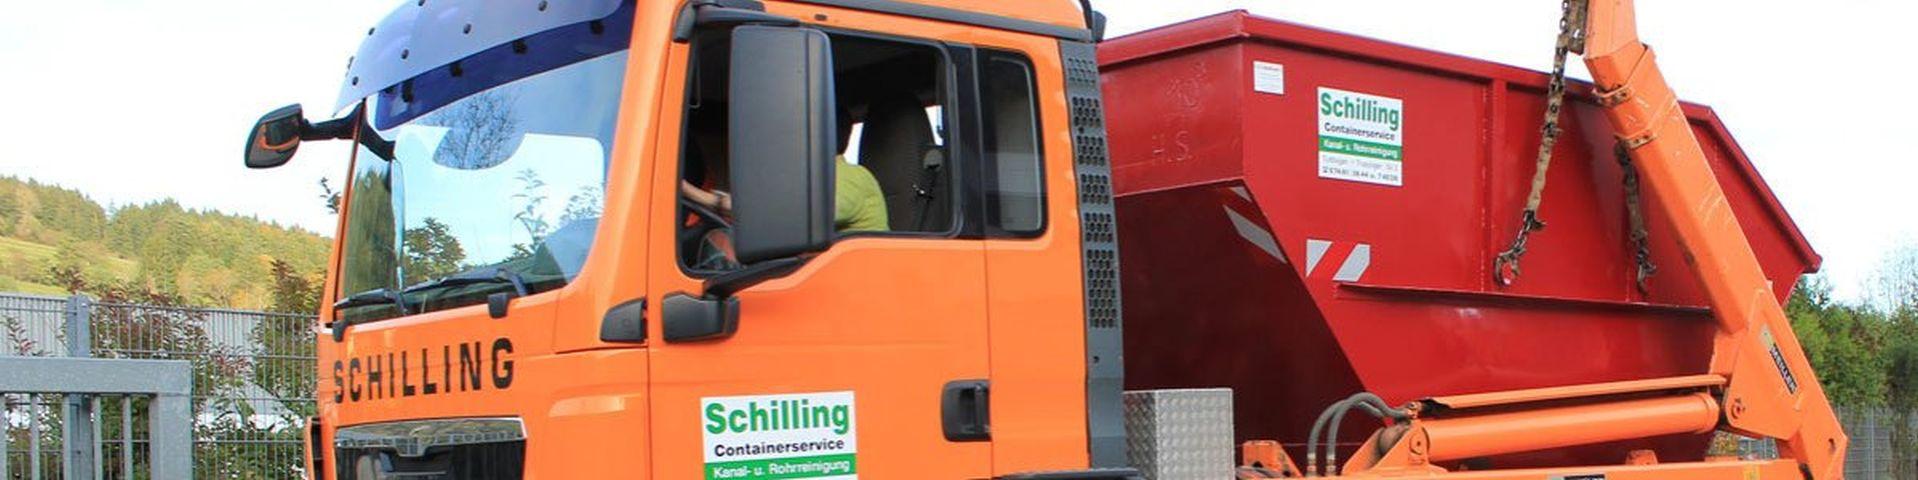 Schilling Herbert GmbH